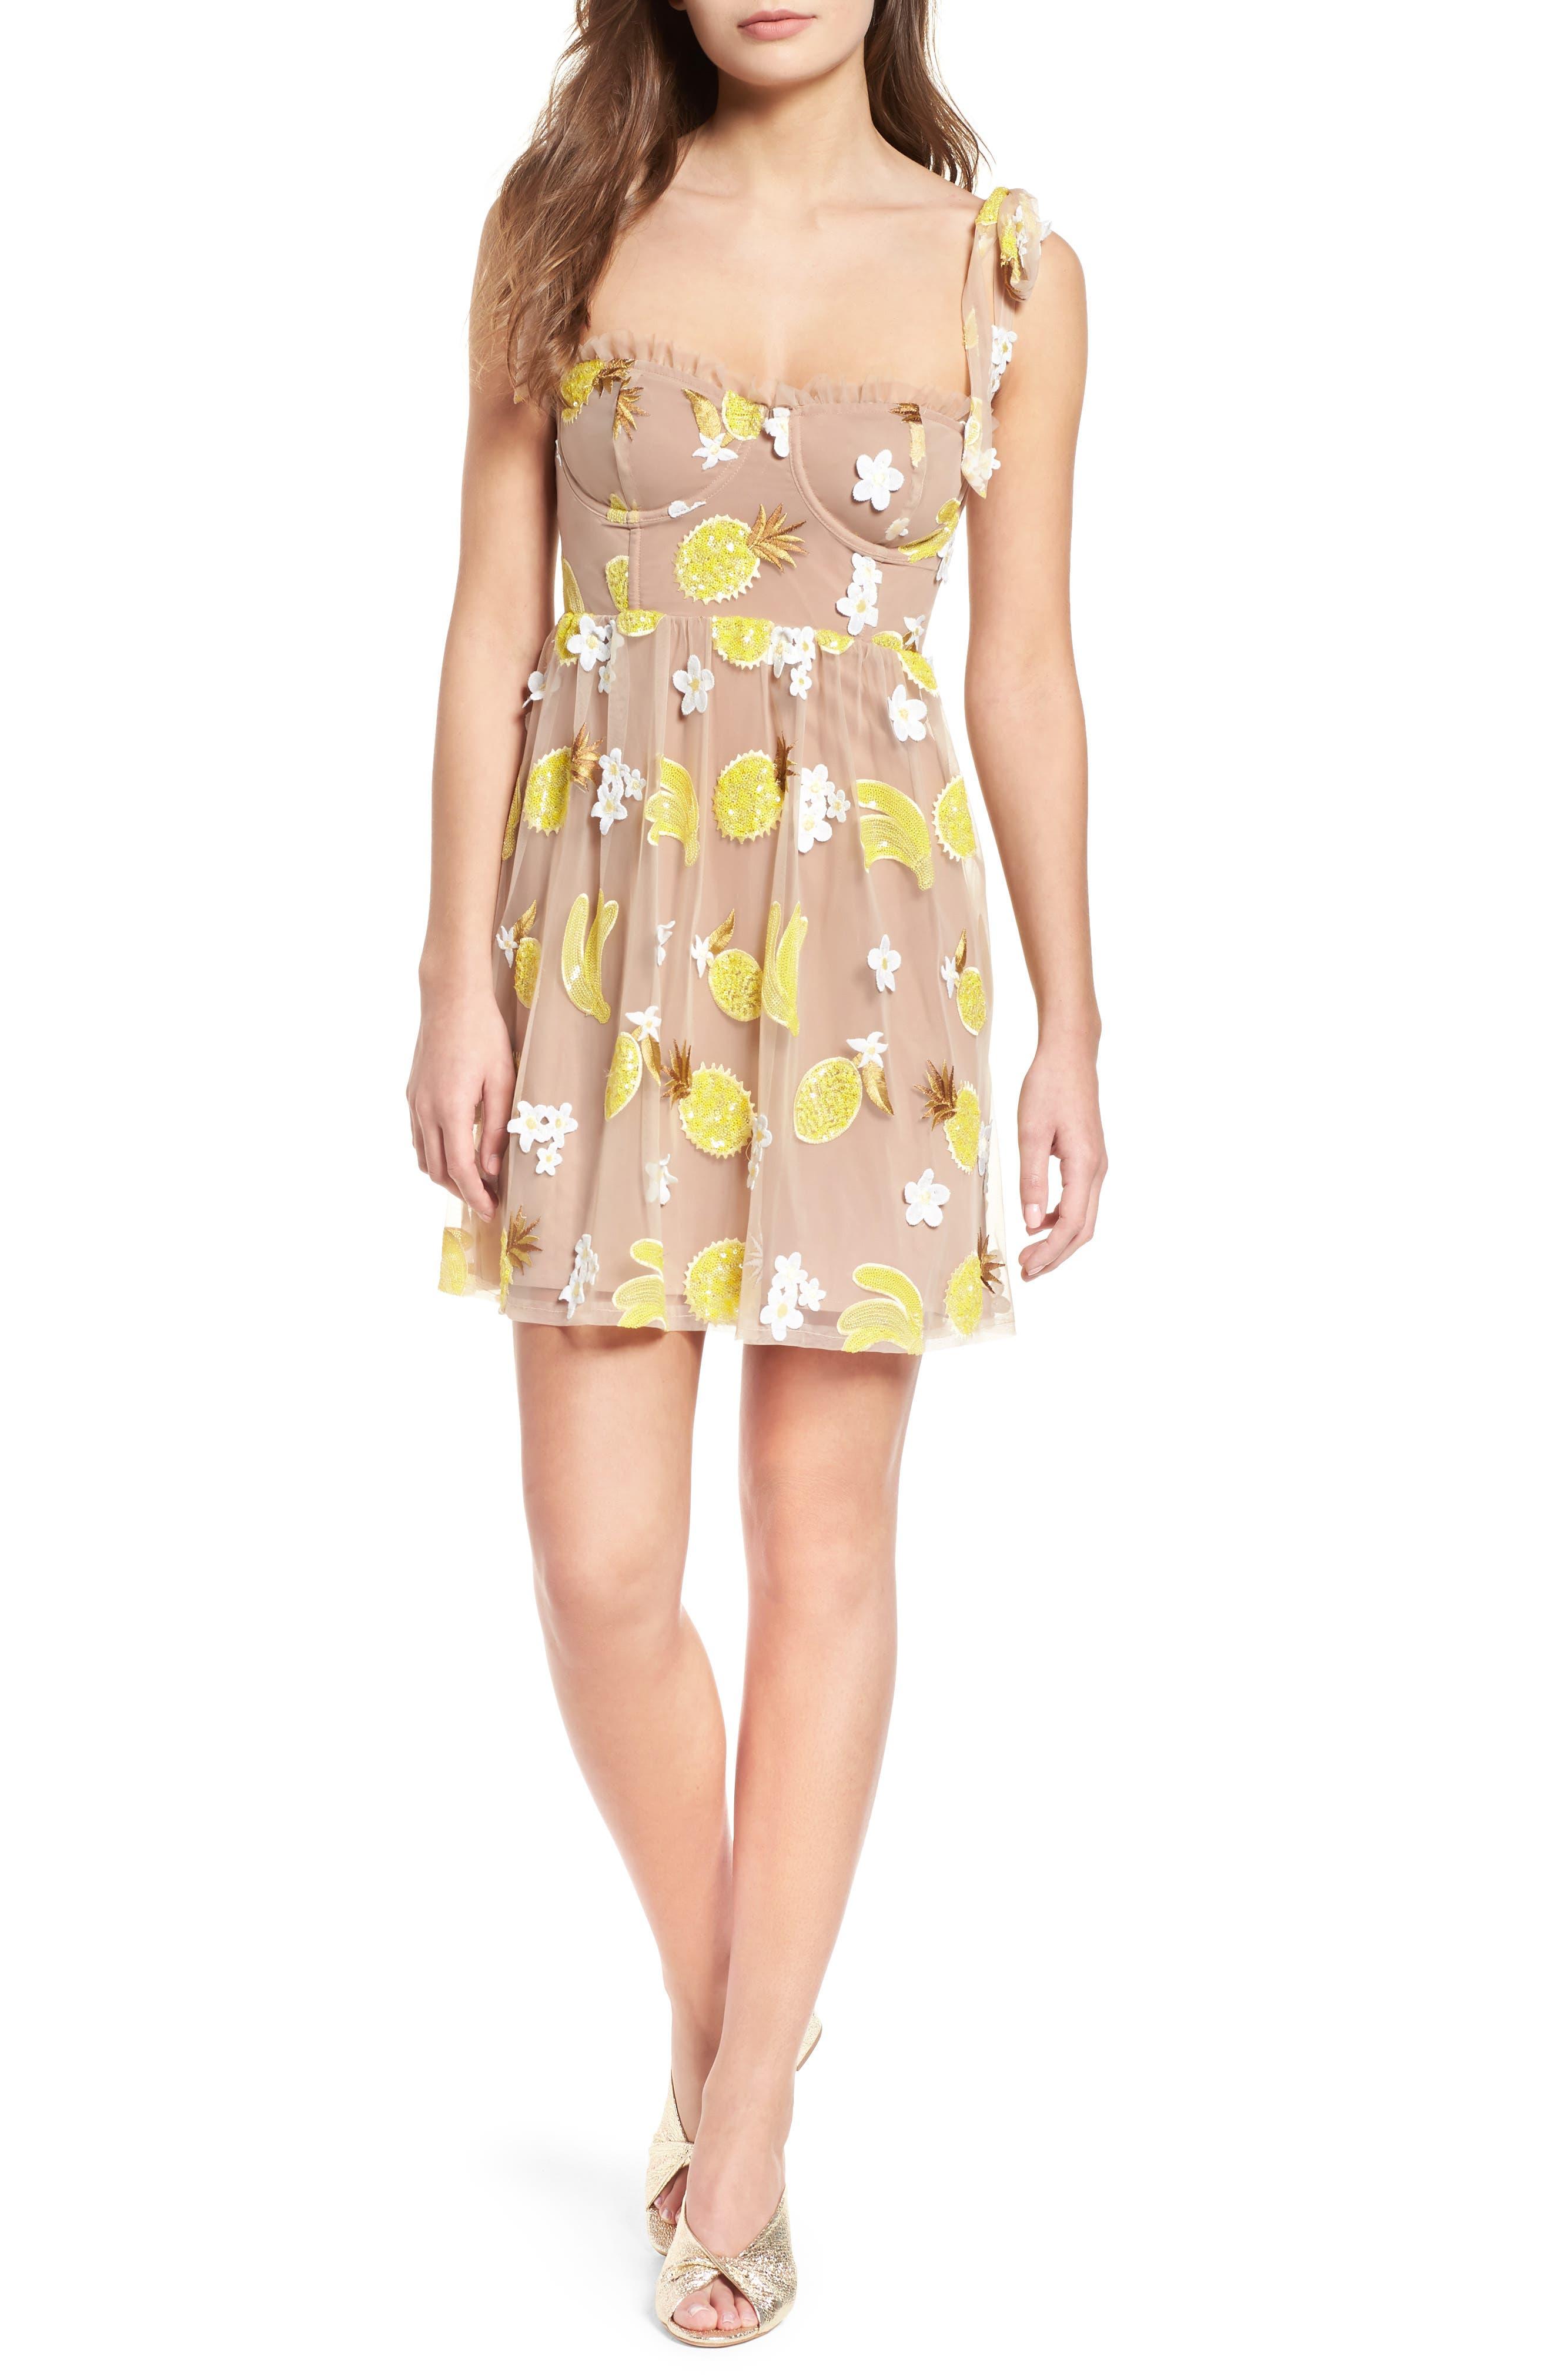 Fruitpunch Sequin Minidress,                         Main,                         color, 250